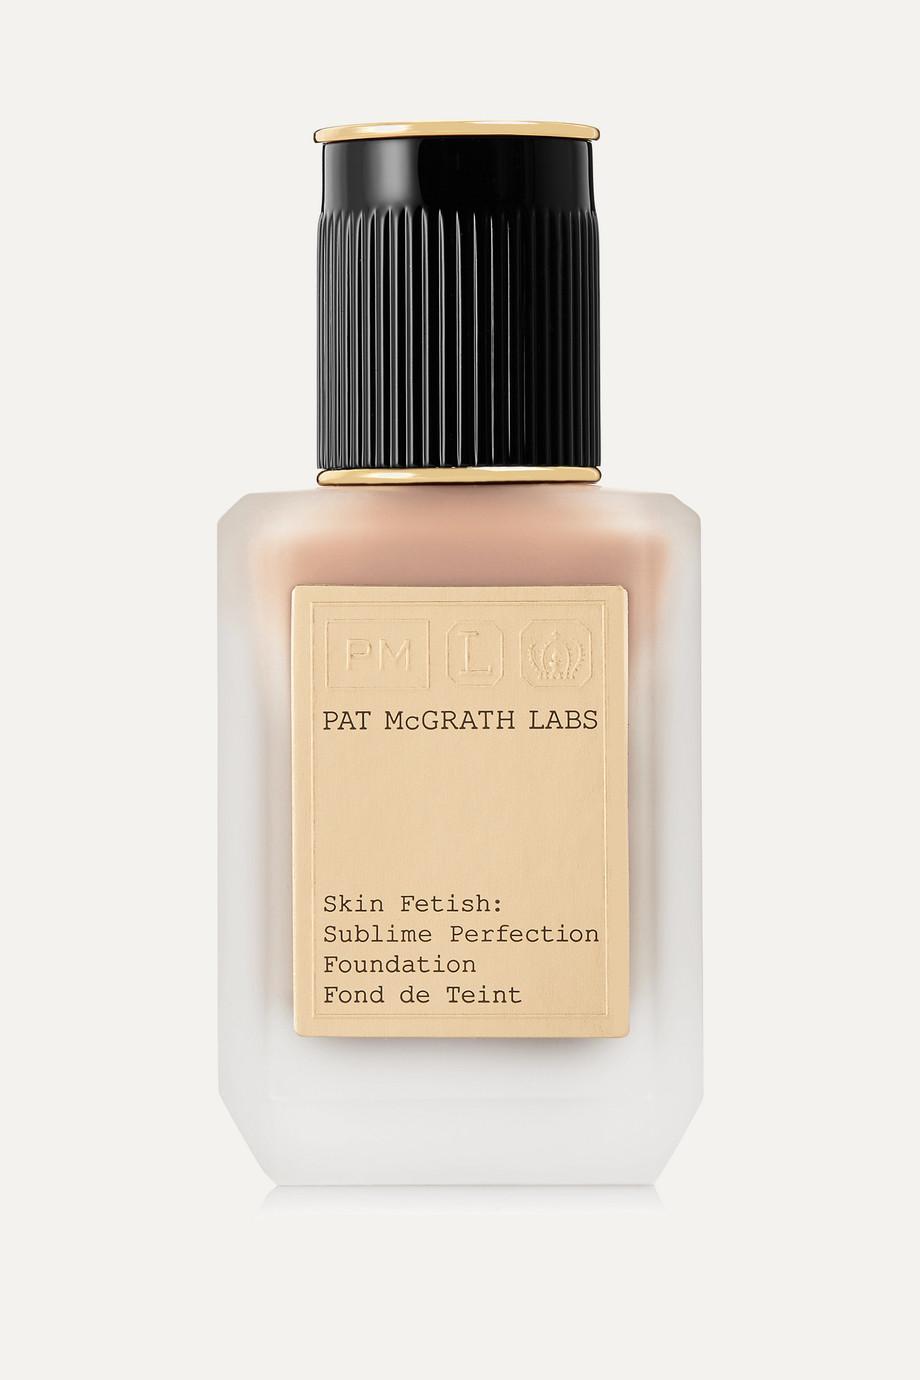 Pat McGrath Labs Skin Fetish: Sublime Perfection Foundation - Light 6, 35ml